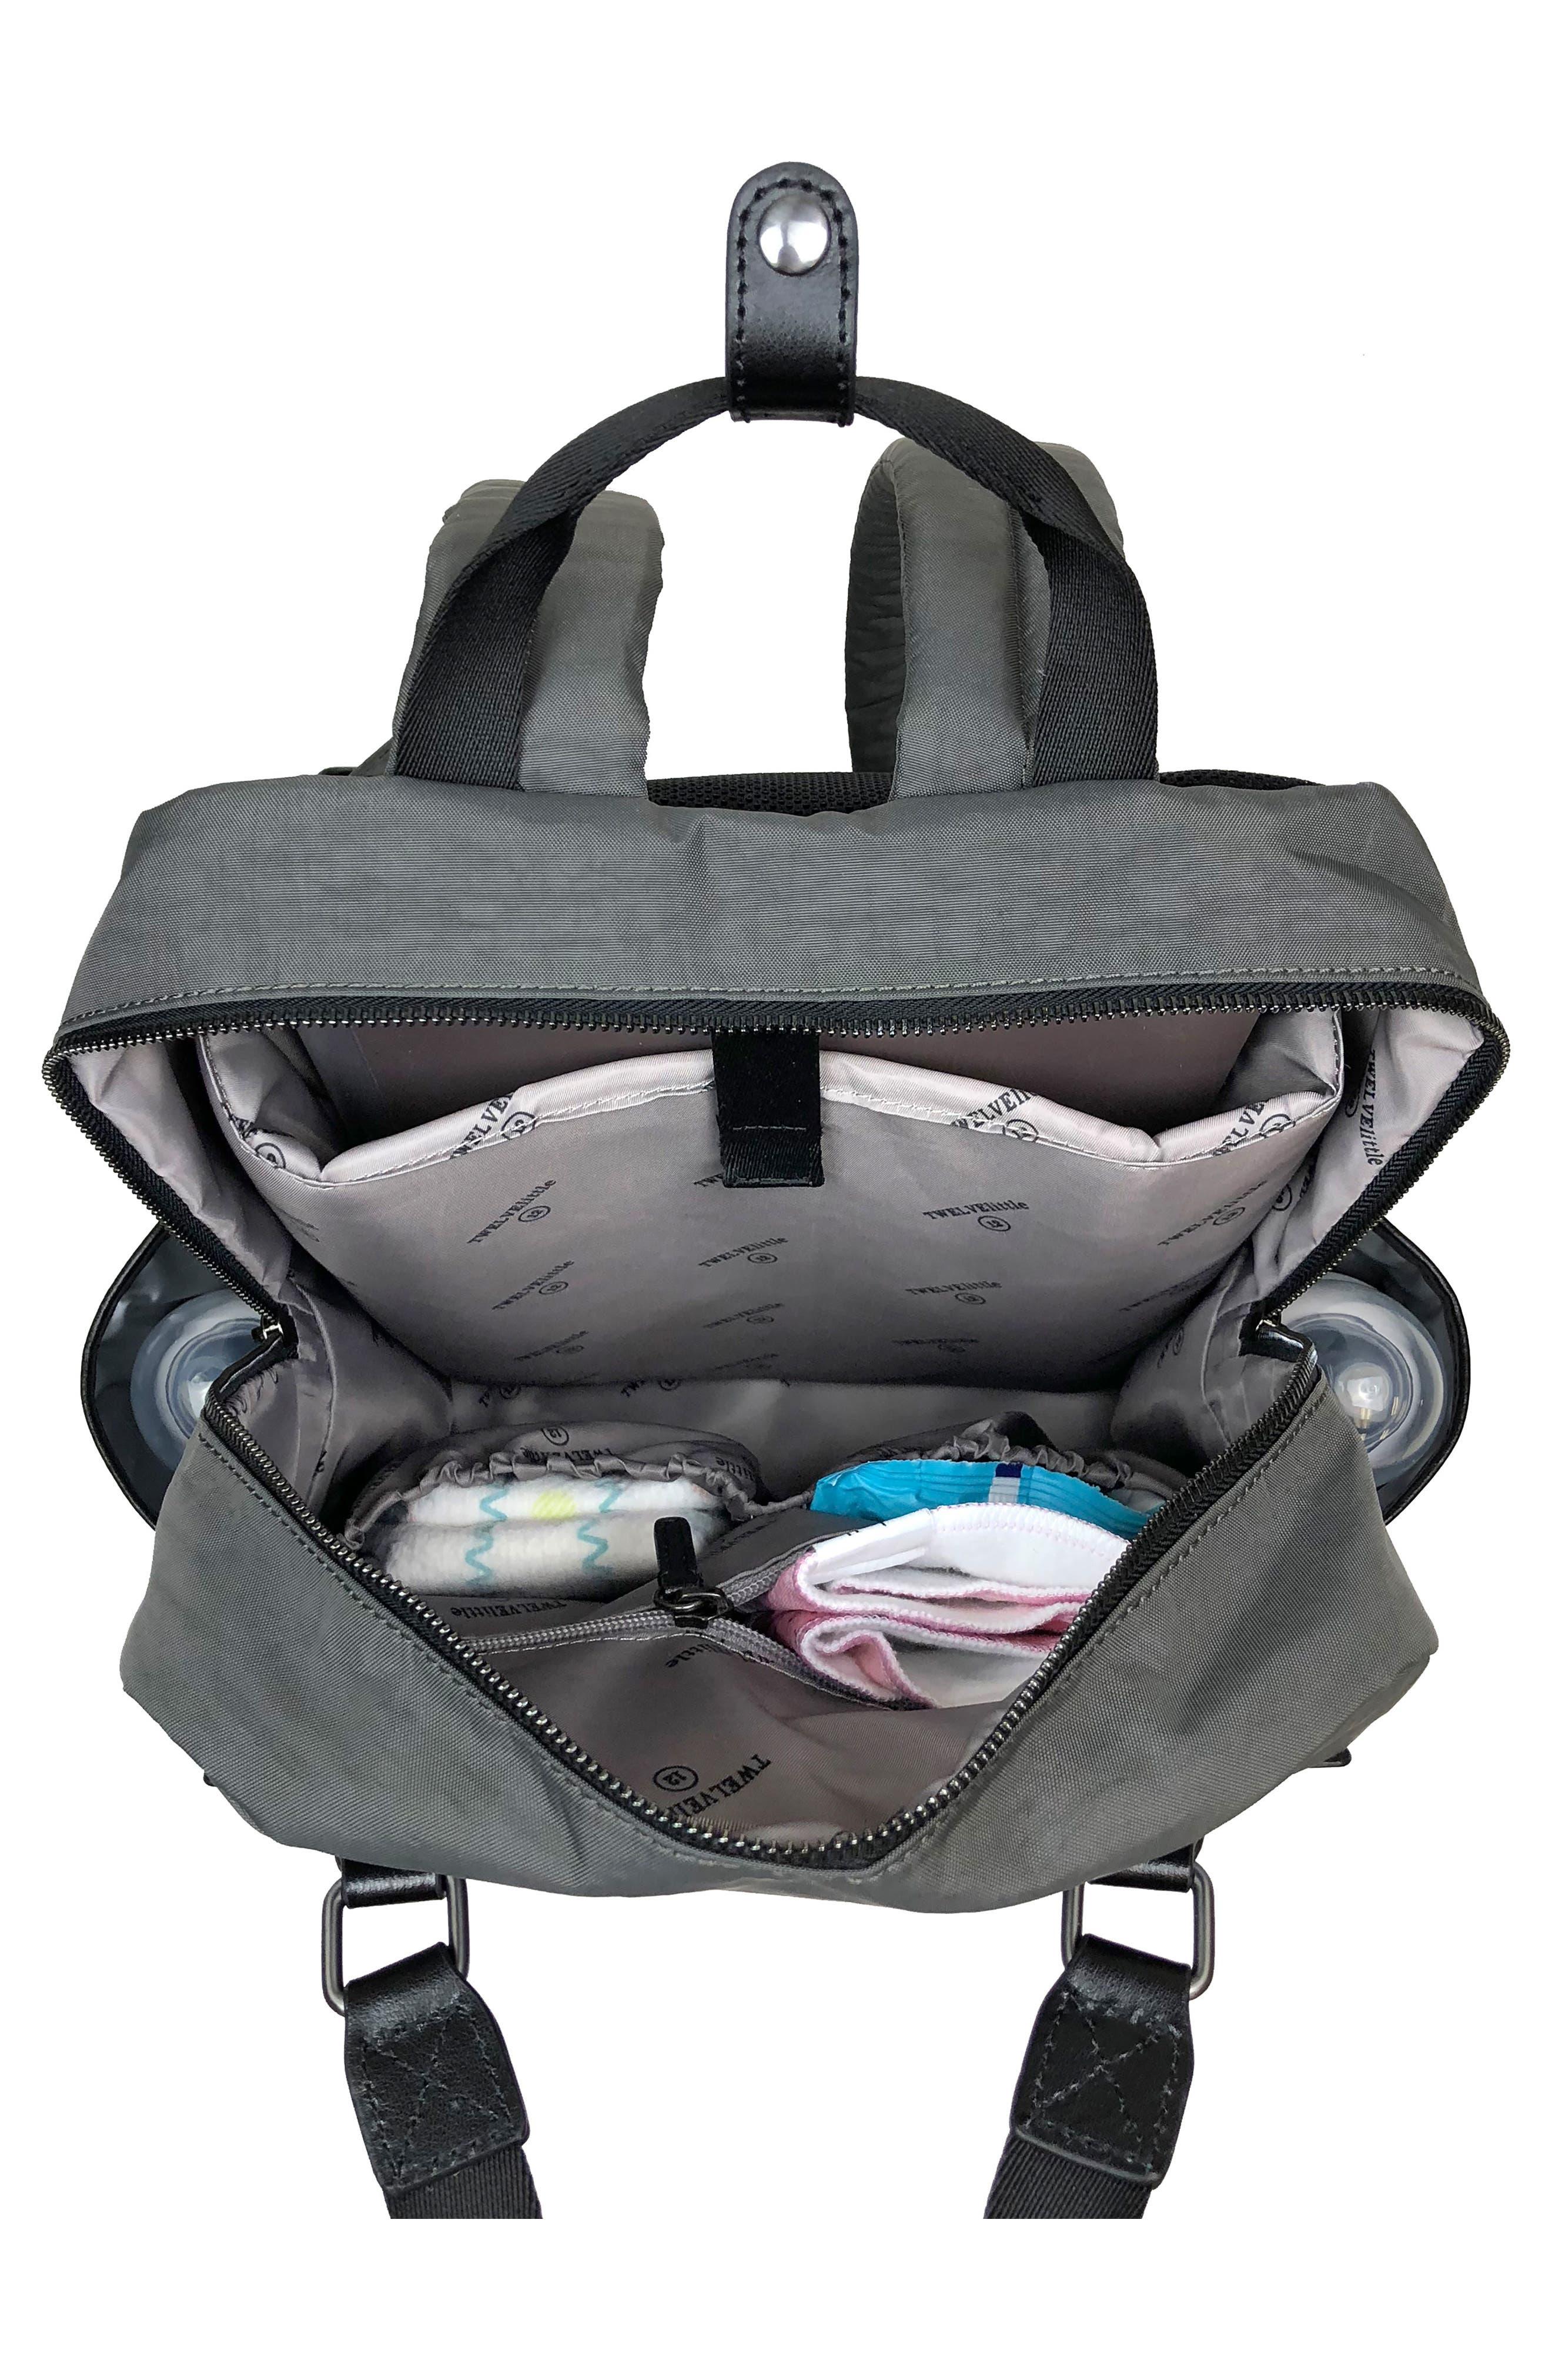 'Courage' Unisex Backpack Diaper Bag,                             Alternate thumbnail 3, color,                             DARK GREY